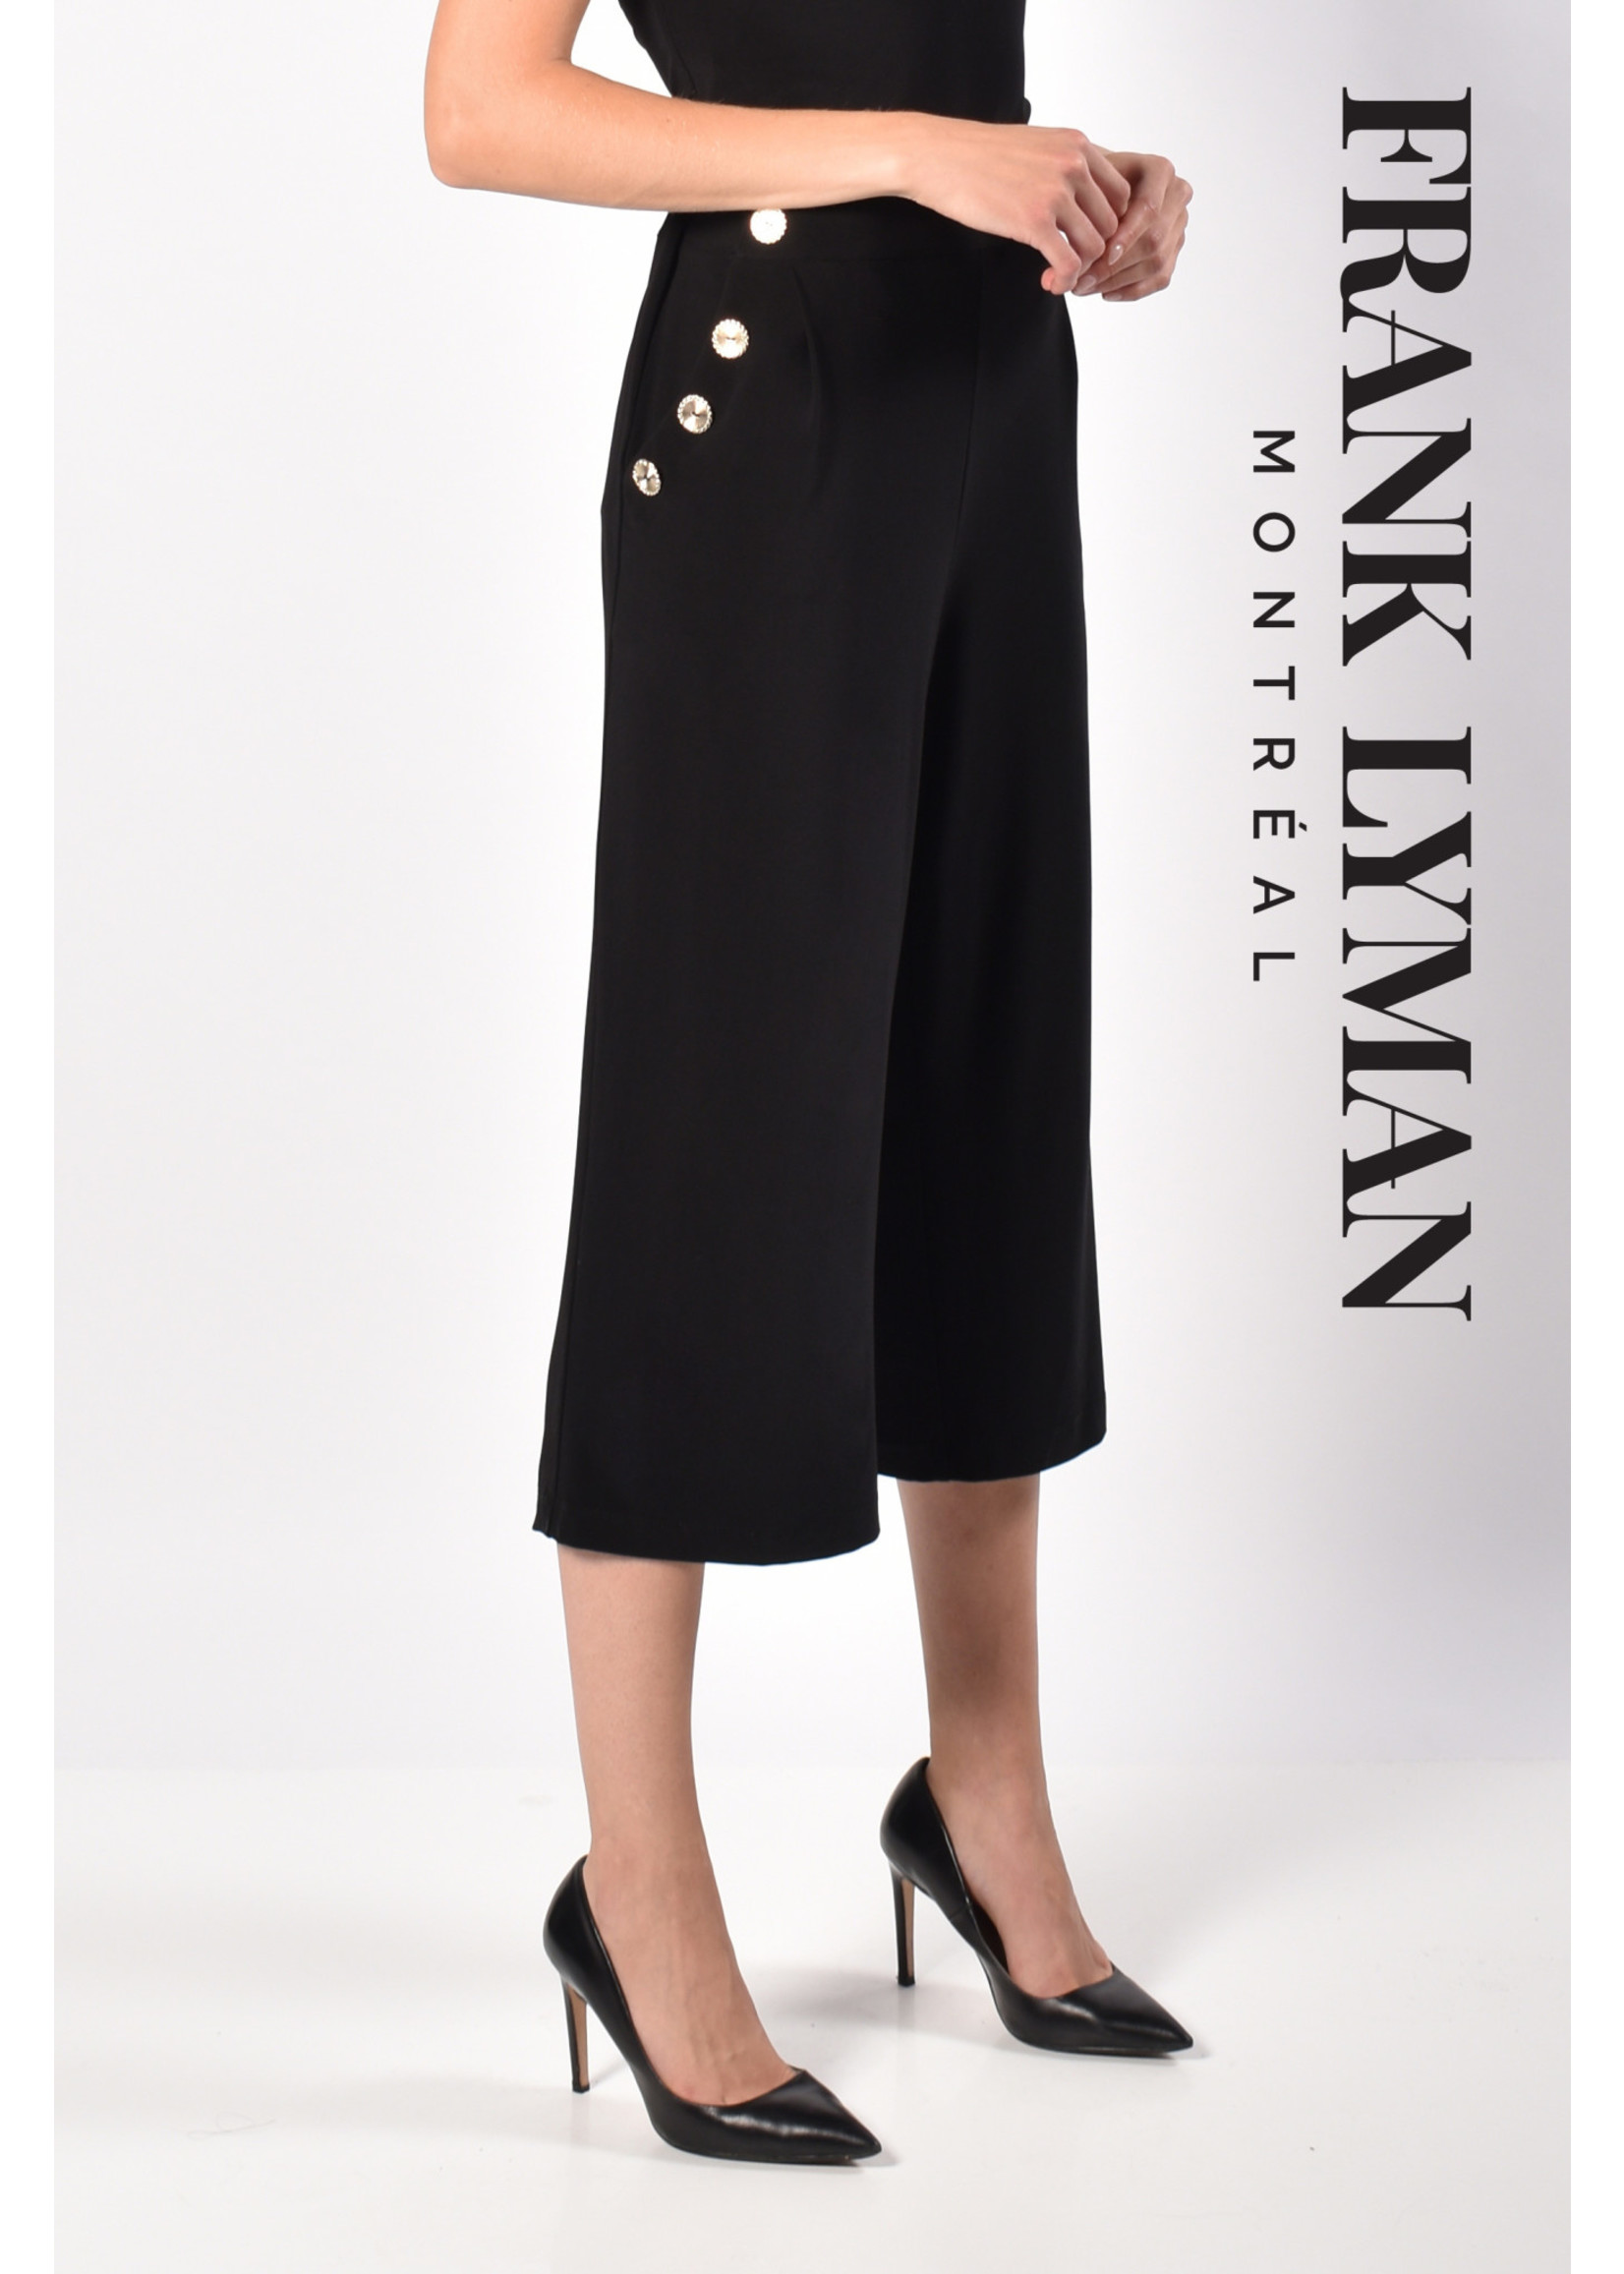 Frank Lyman Black Knit Culottes